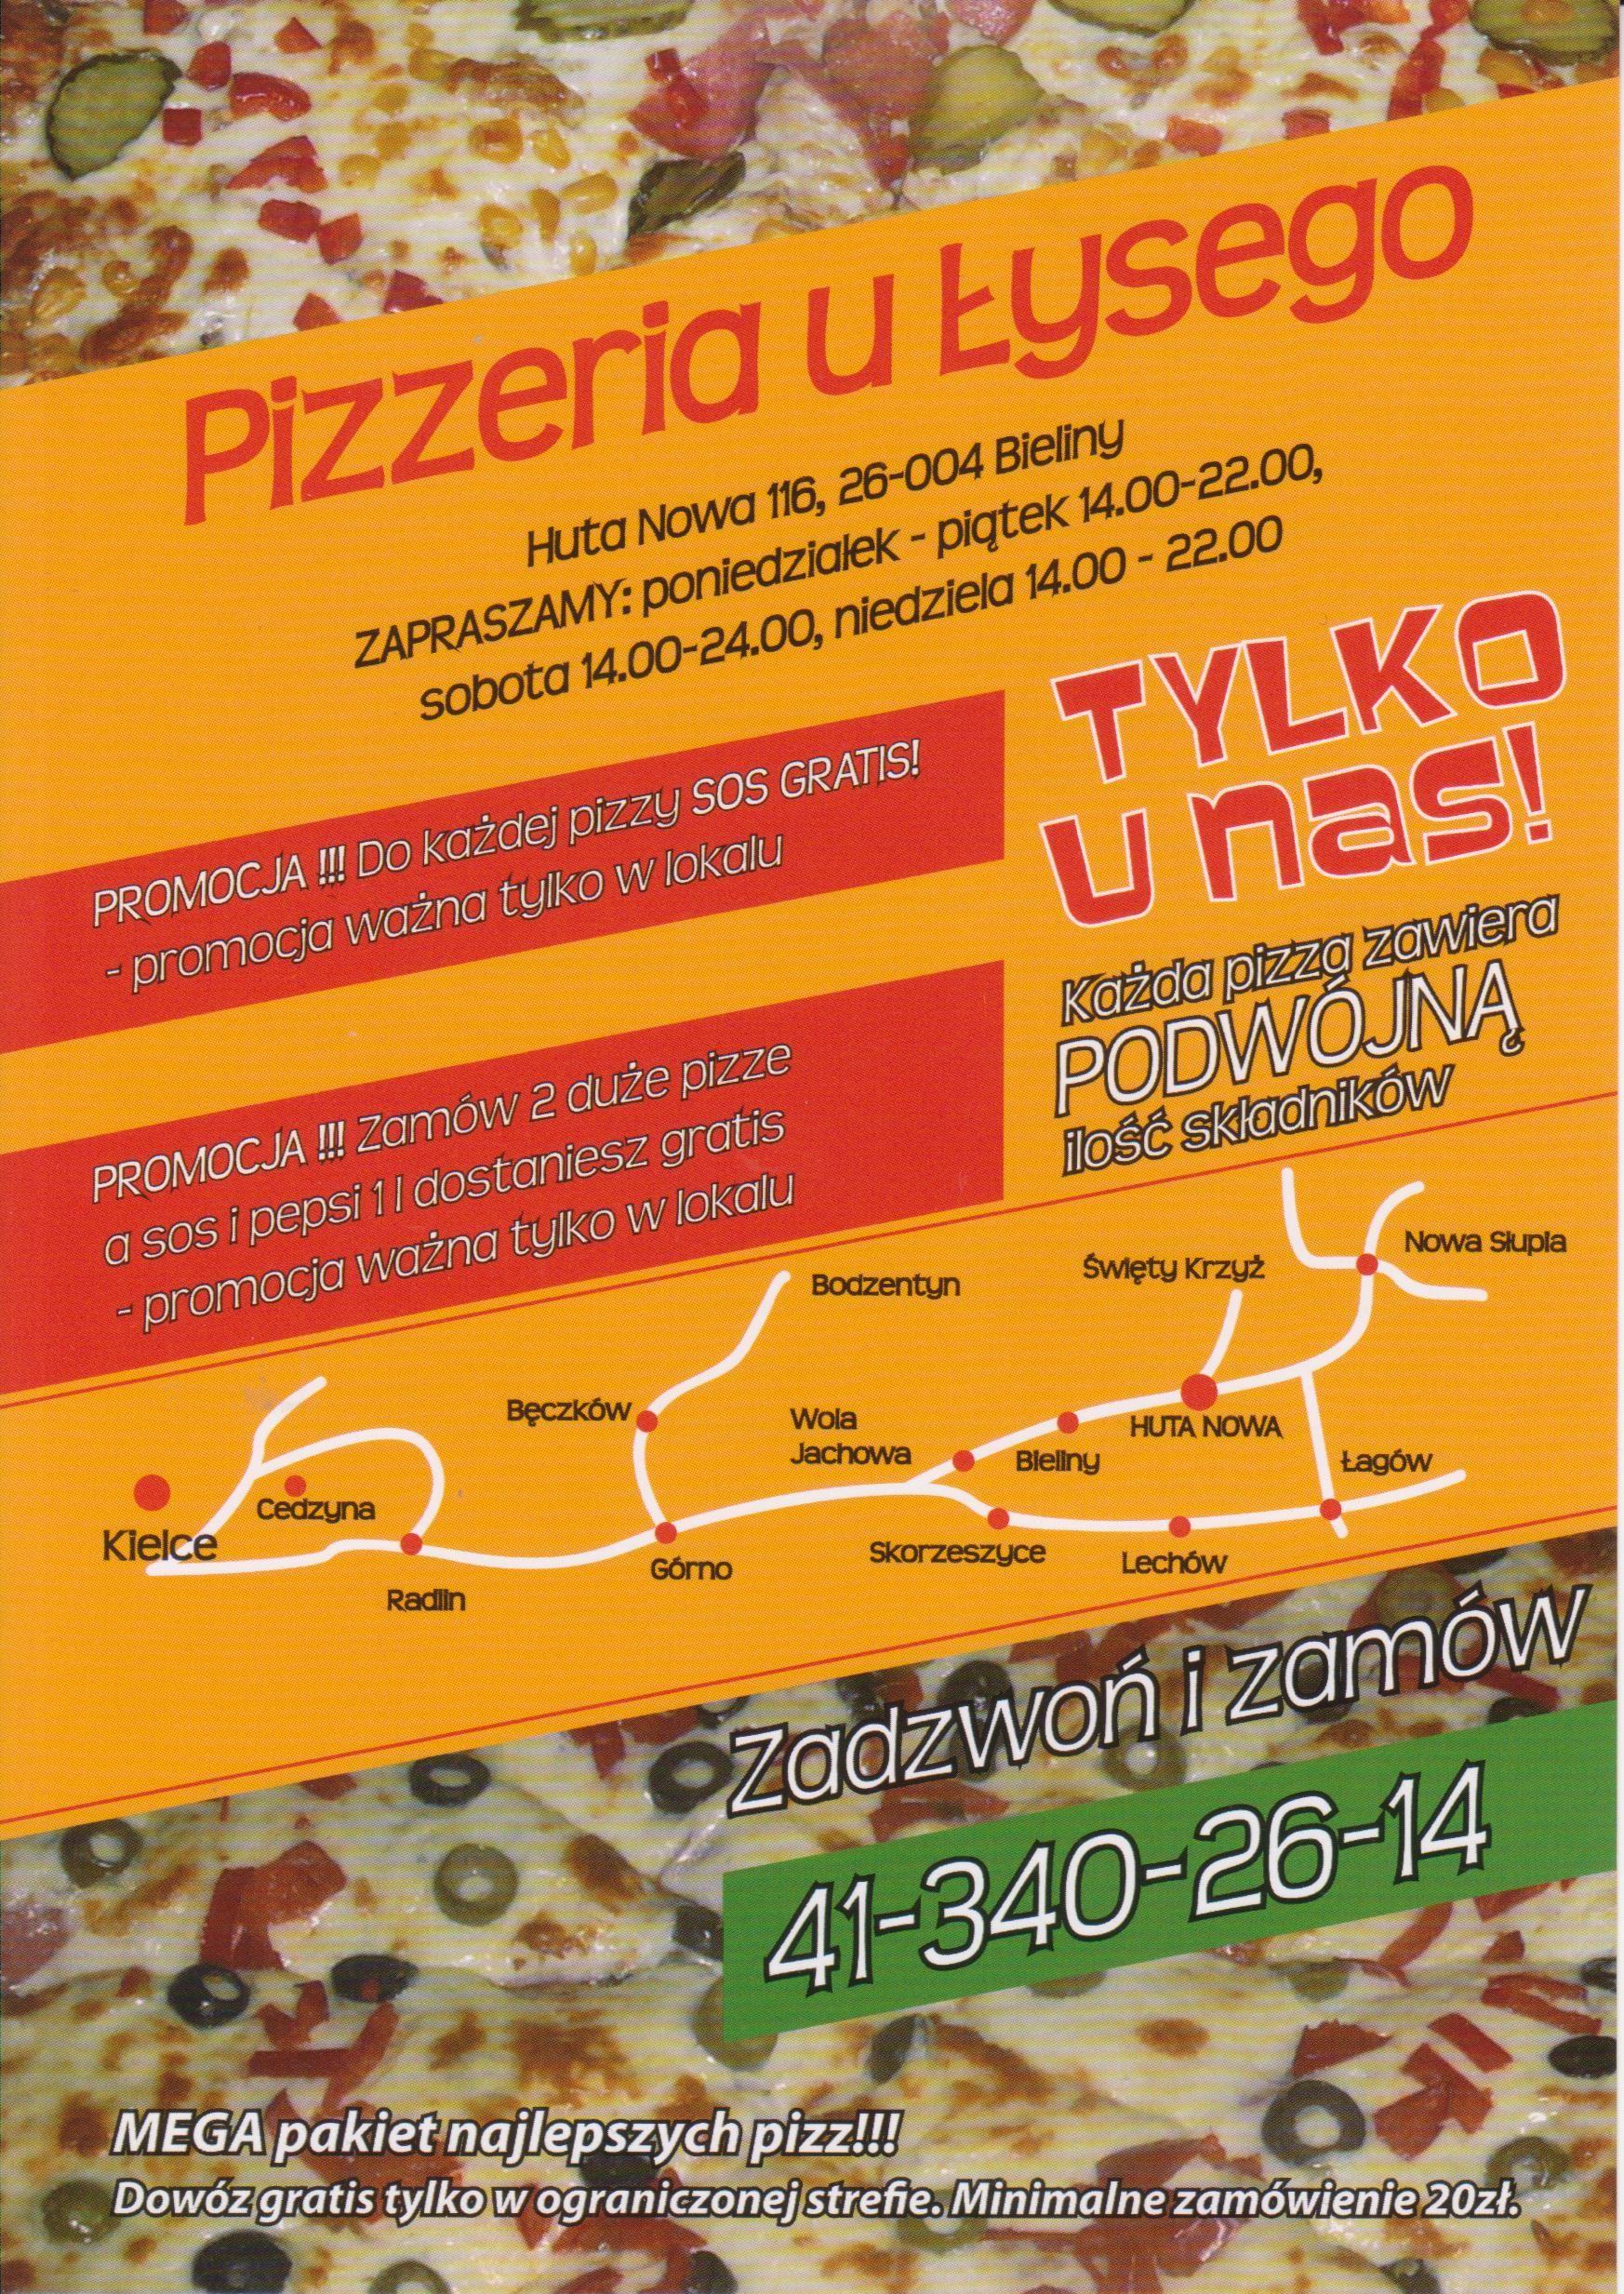 - 2012_02_17_pizzeria.jpg